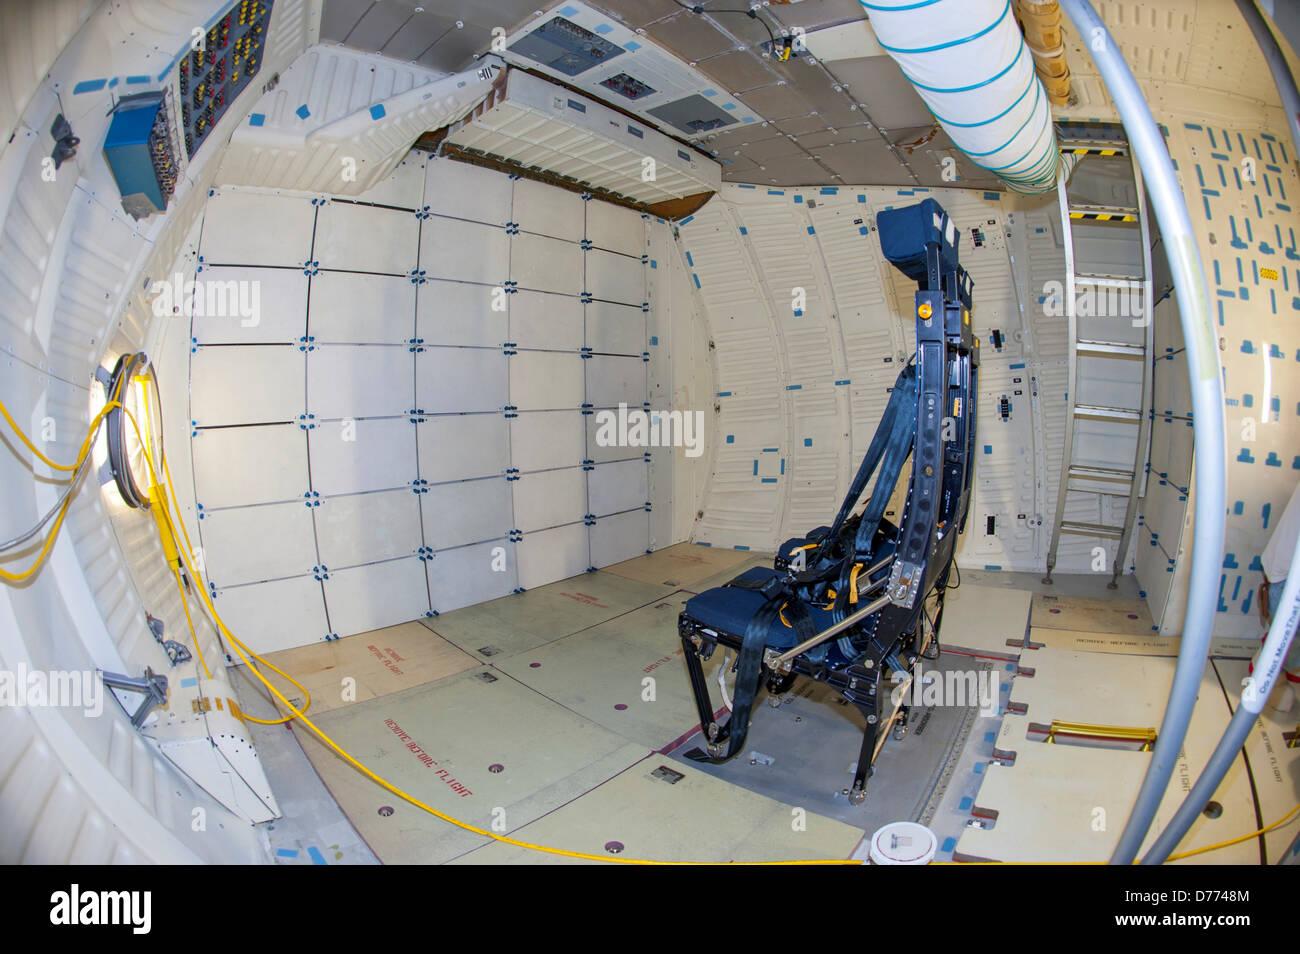 space shuttle seats - photo #11